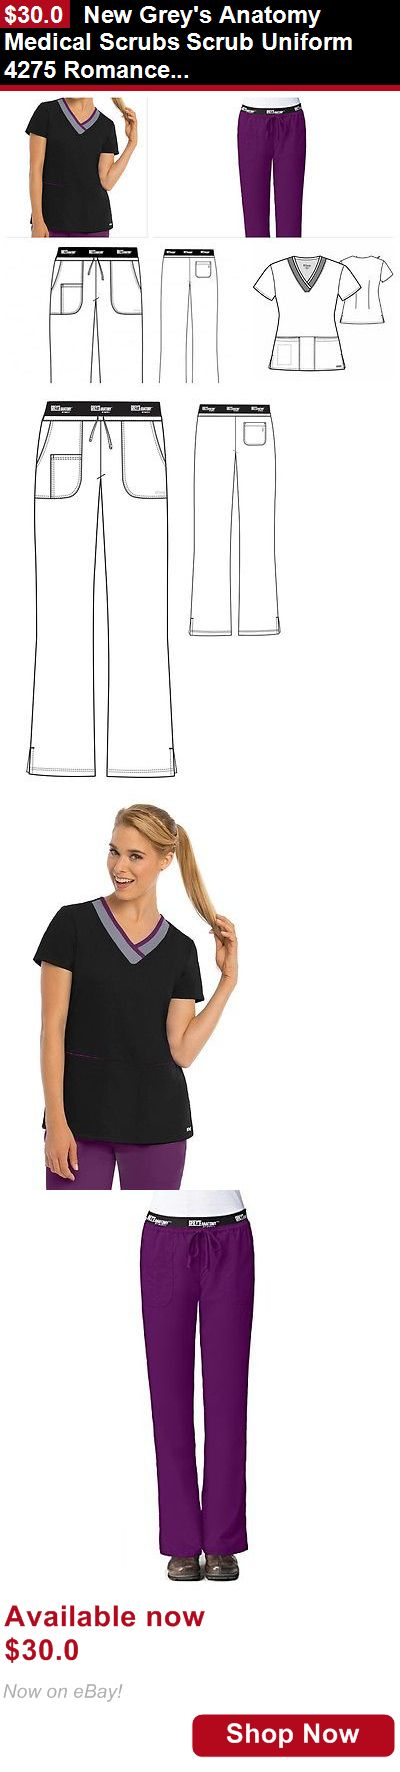 Adult uniforms: New Greys Anatomy Medical Scrubs Scrub Uniform 4275 Romance 41399 Pants Or Top BUY IT NOW ONLY: $30.0